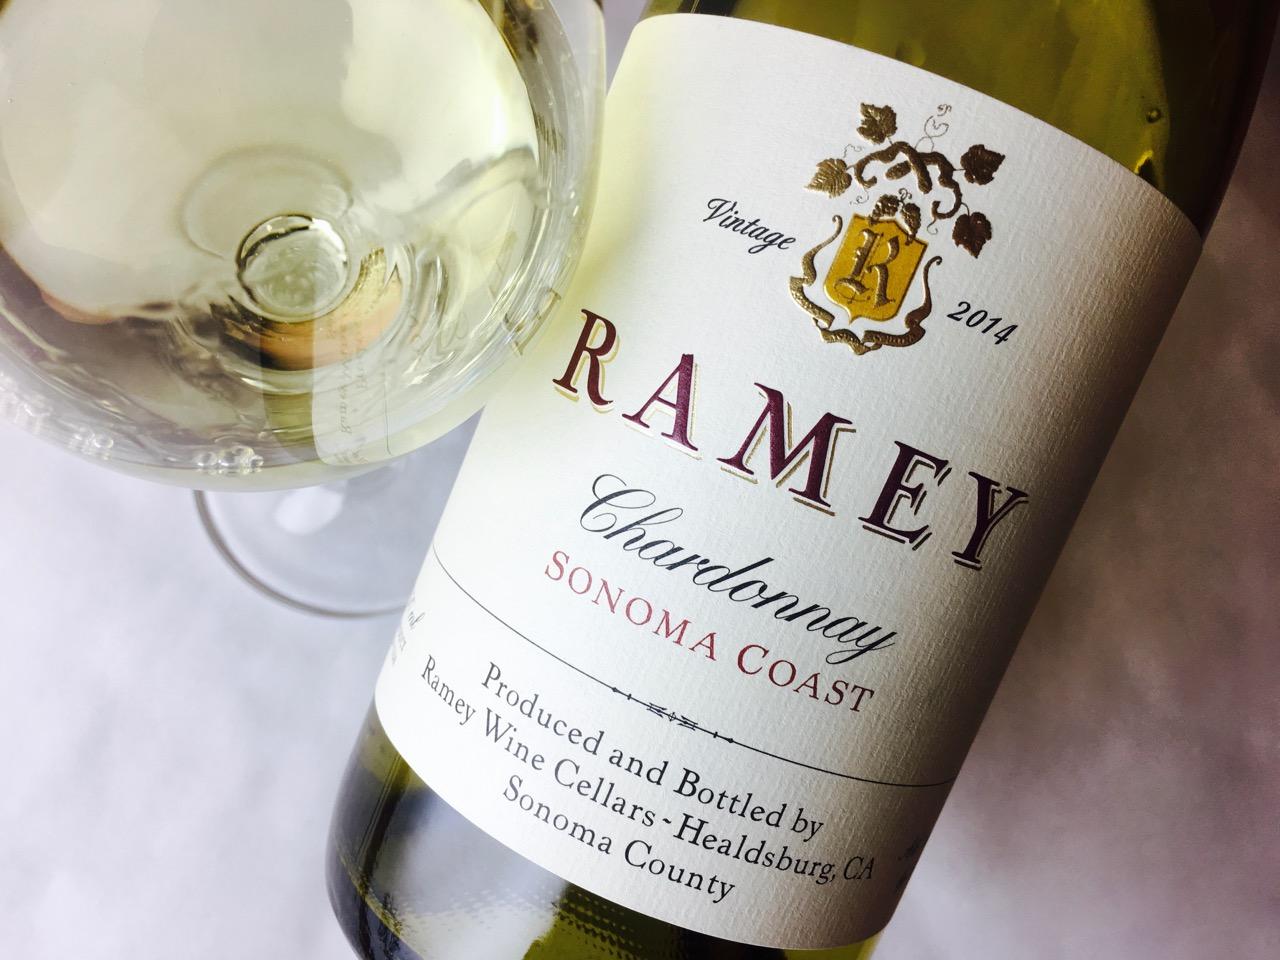 2014 Ramey Chardonnay Sonoma Coast